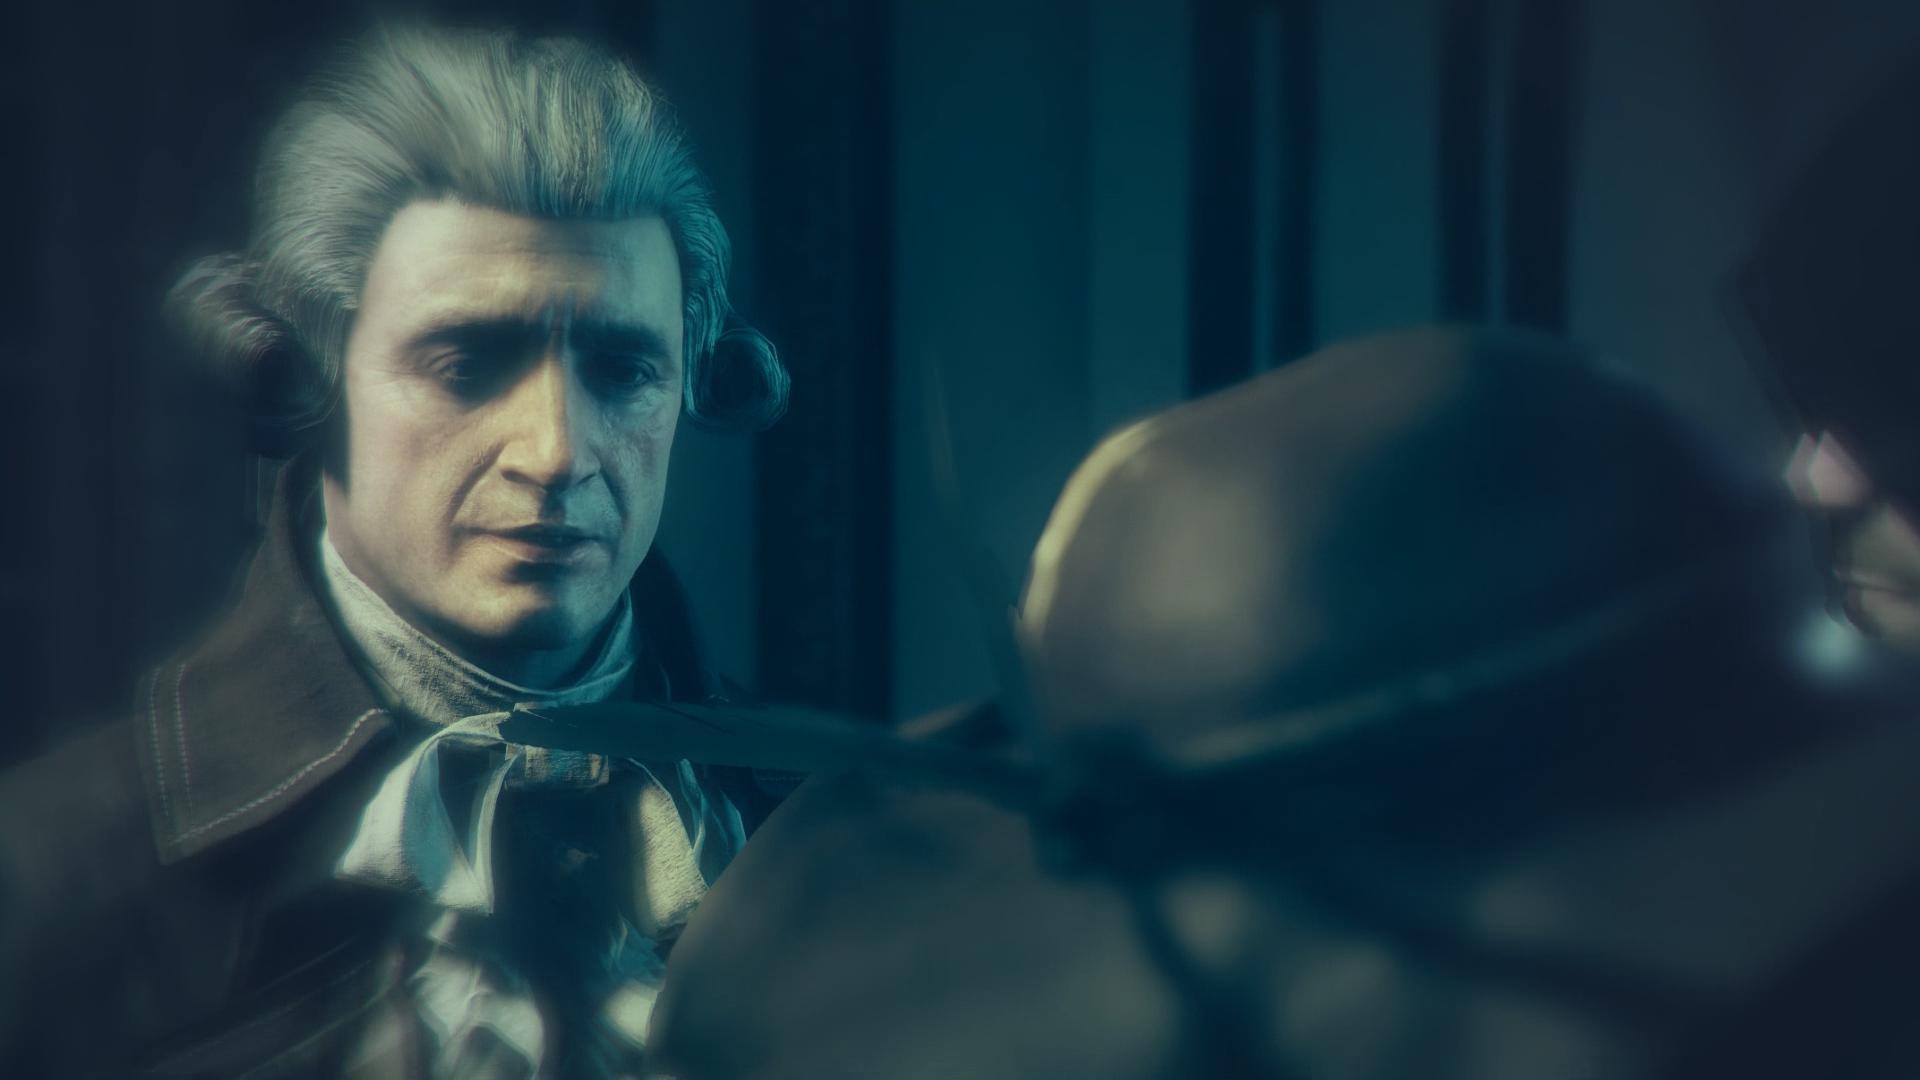 Encuentro de Robespierre con La Touche. Imagen del juego Assassin's Creed: Unity.